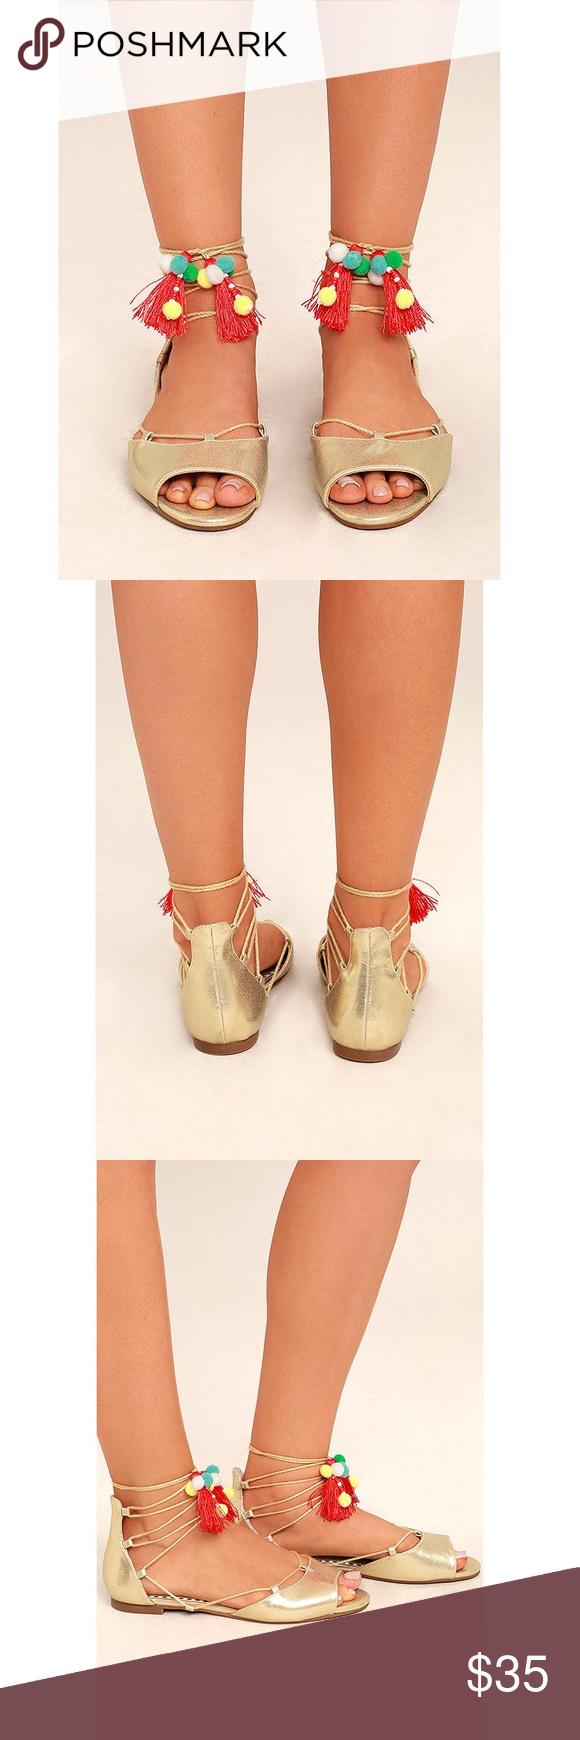 4060cd5147d Betsey Johnson Abree Gold Lace-Up Pompom Sandals -Brand new -Metallic gold  vegan